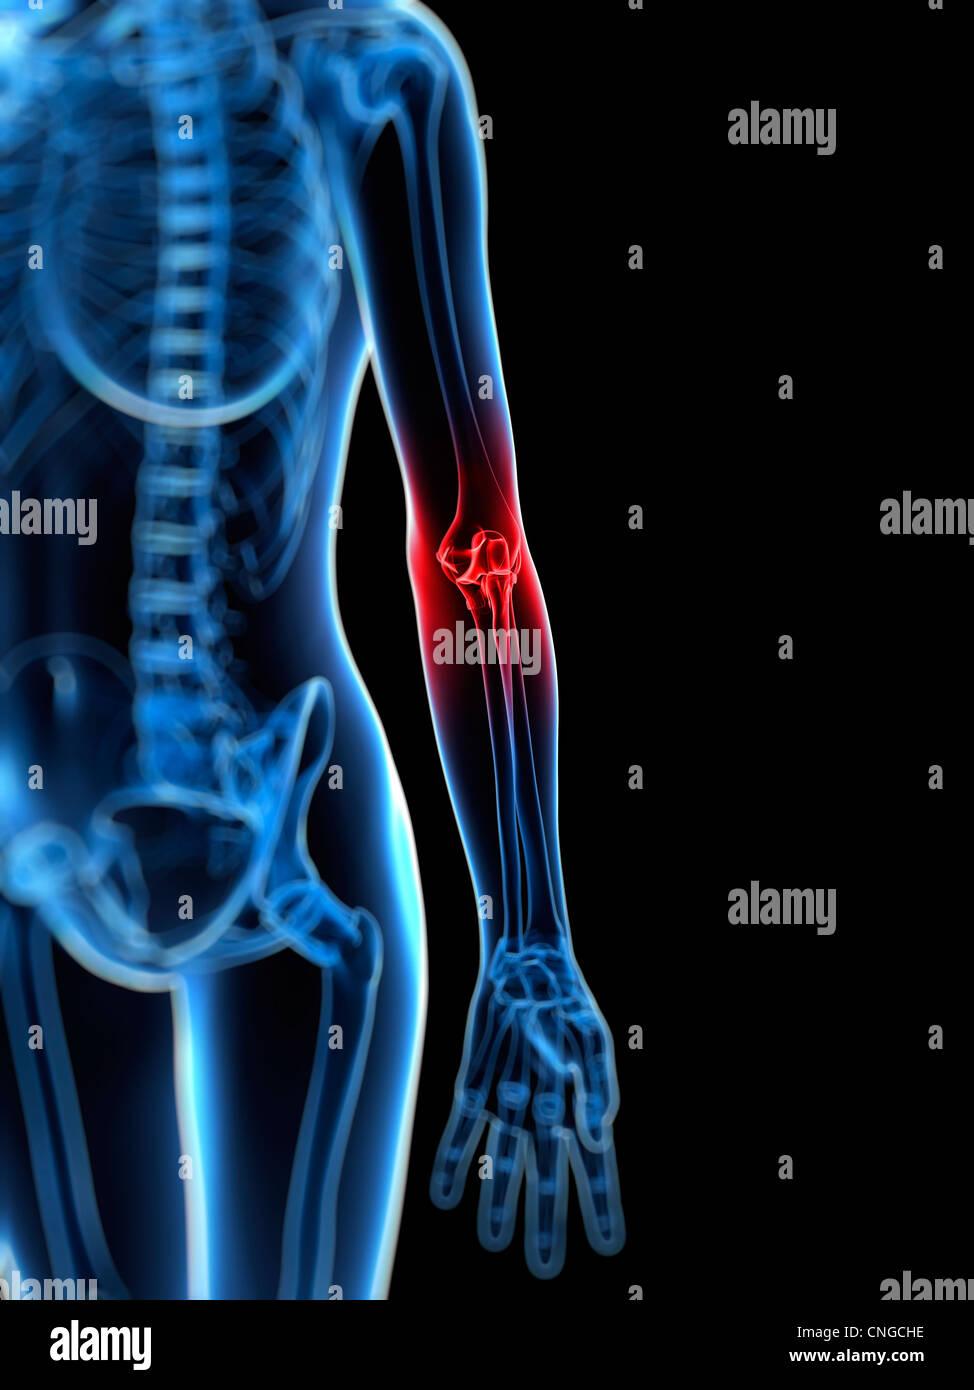 Elbow Bone Stock Photos & Elbow Bone Stock Images - Alamy